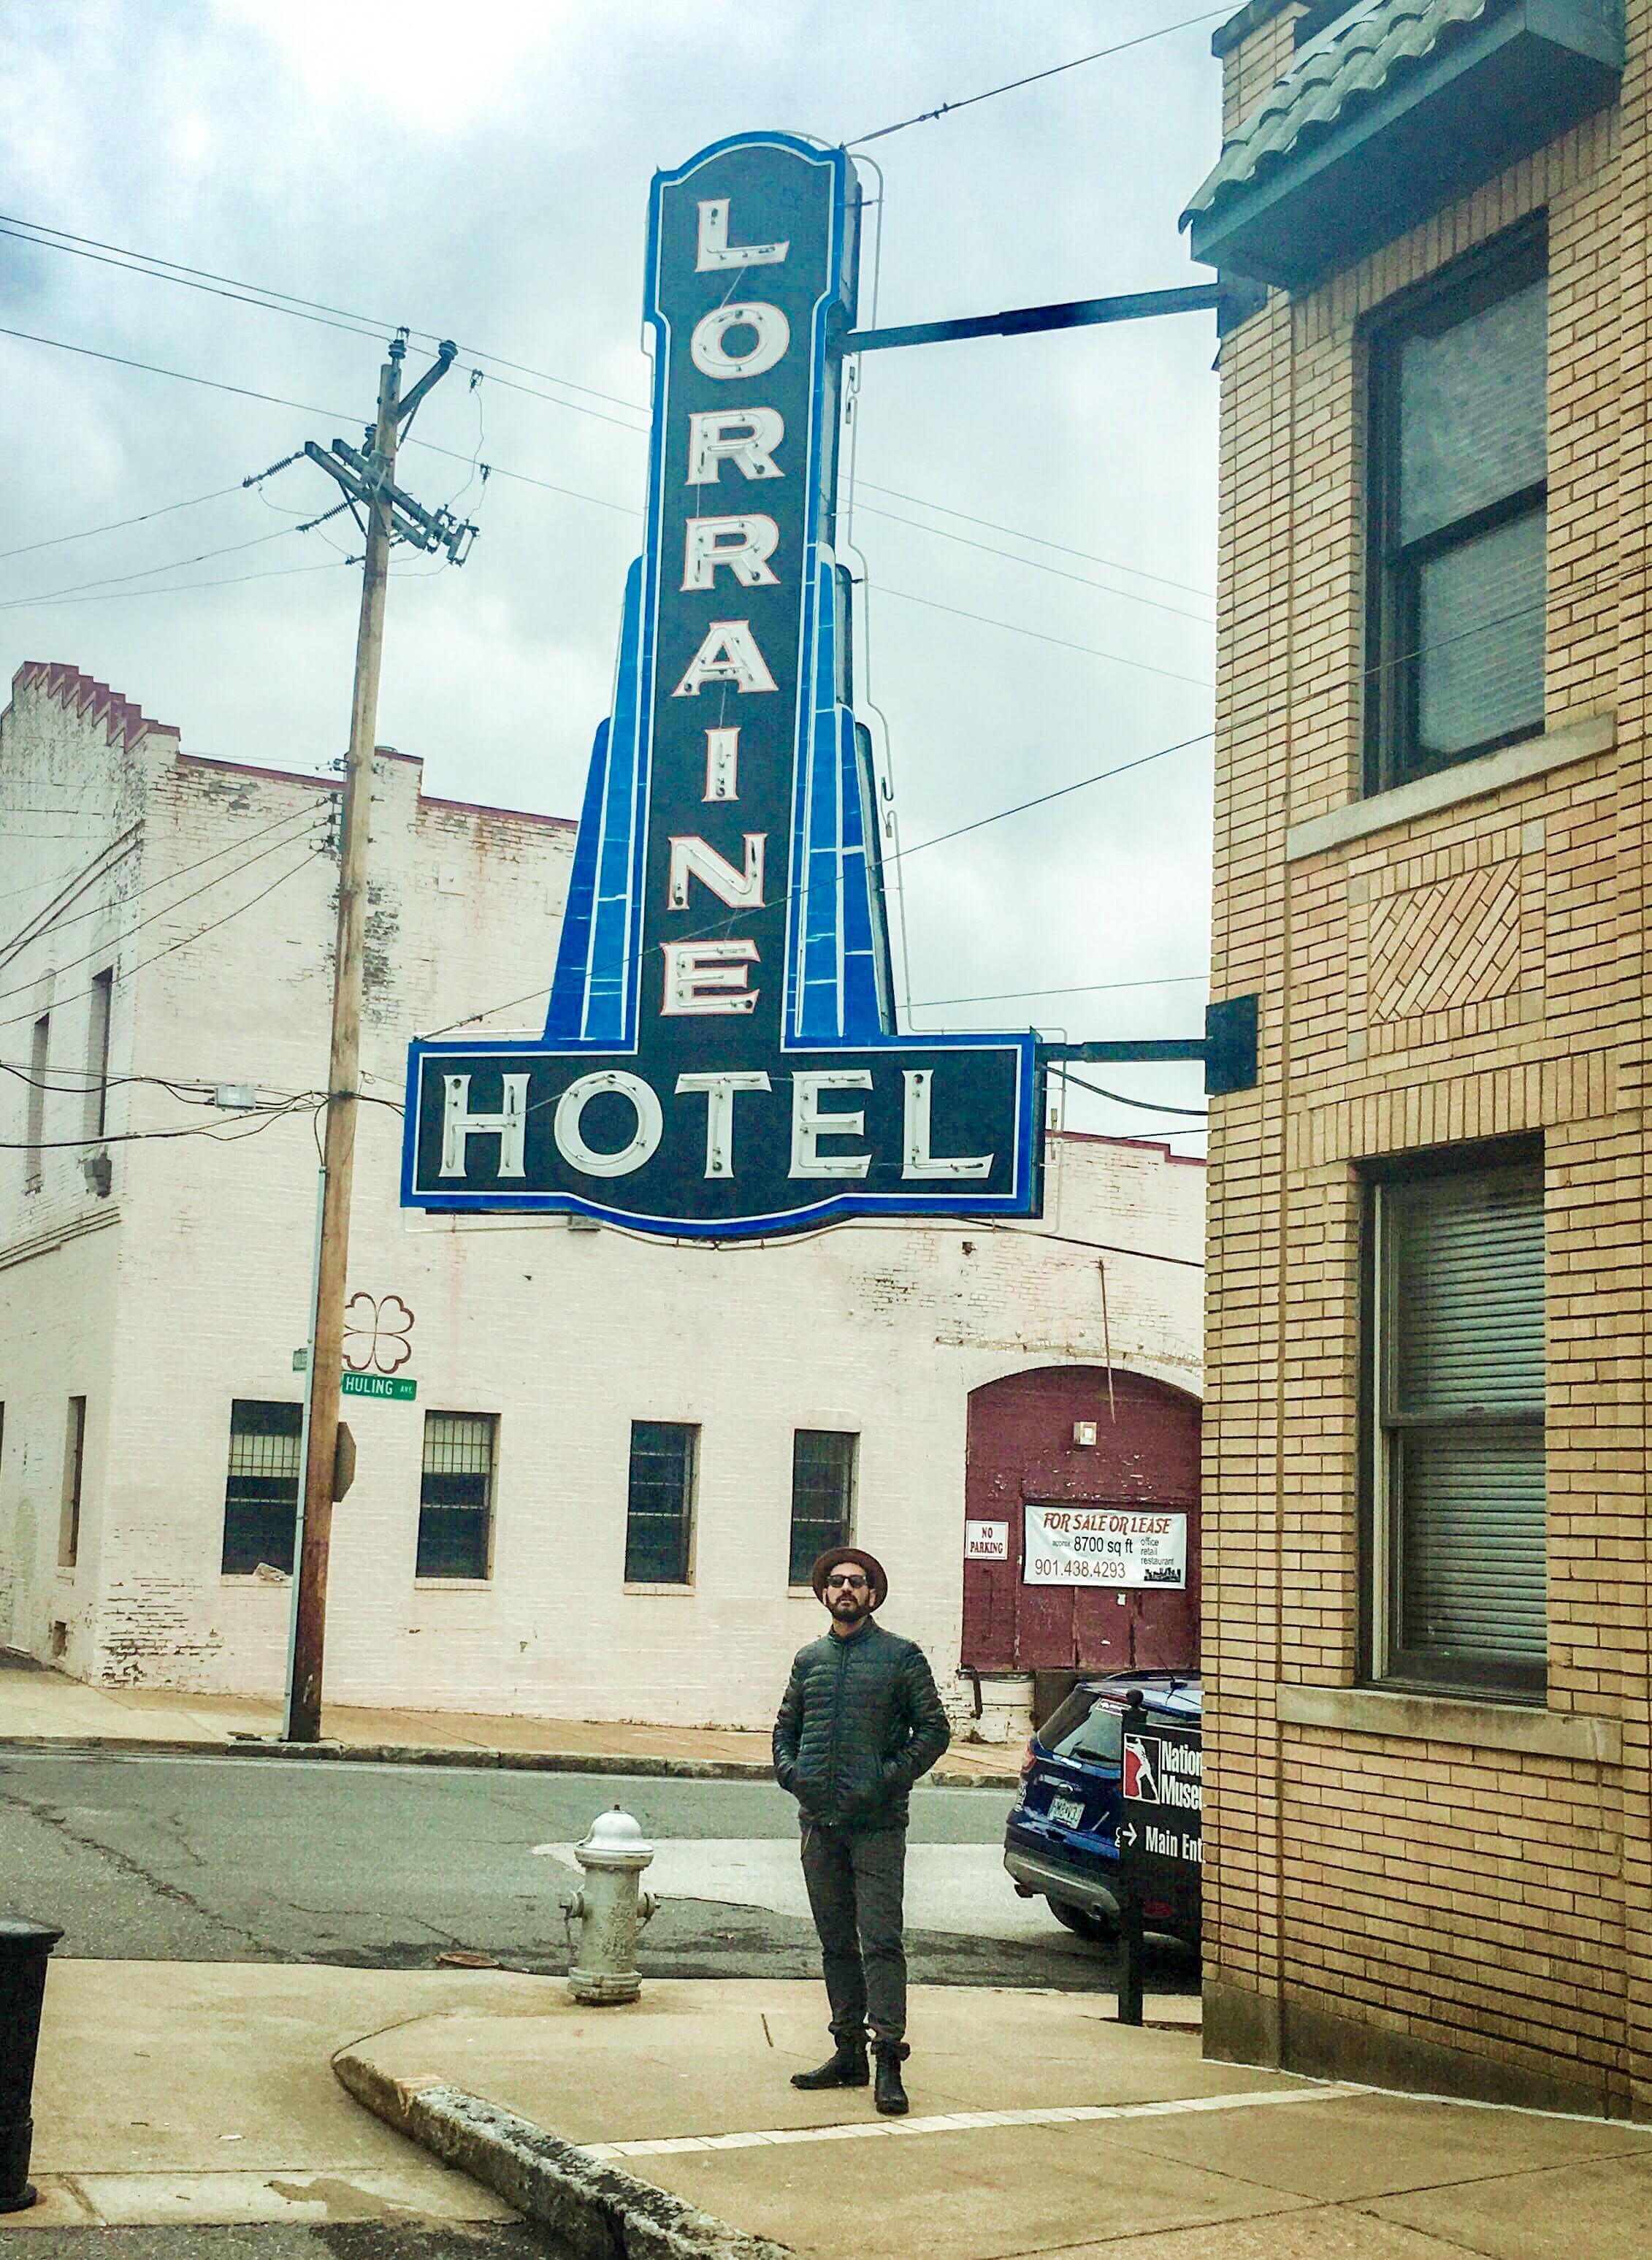 Lorraine Motel, Memphis TN, 2018